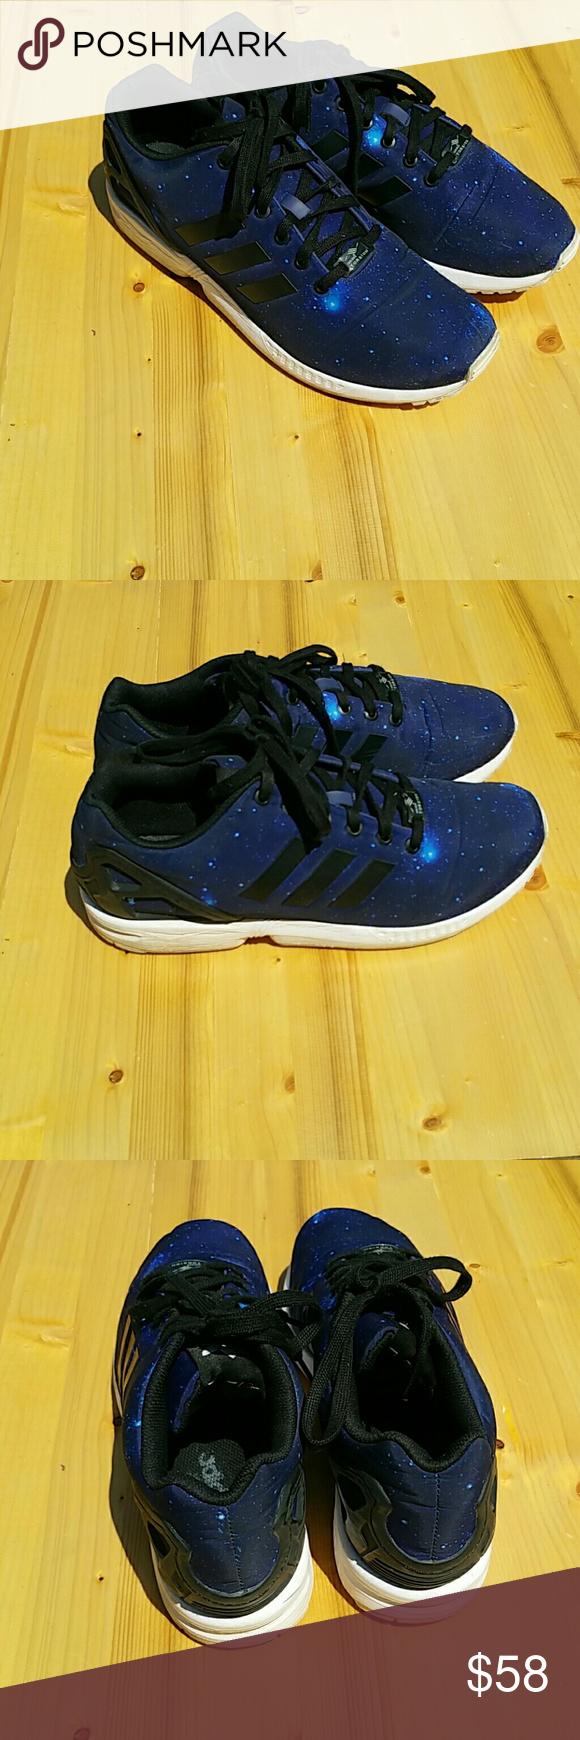 f397d5251d39 ... reduced adidas torsion zx flux galaxy men size 11 adidas zx flux galaxy  men size 11